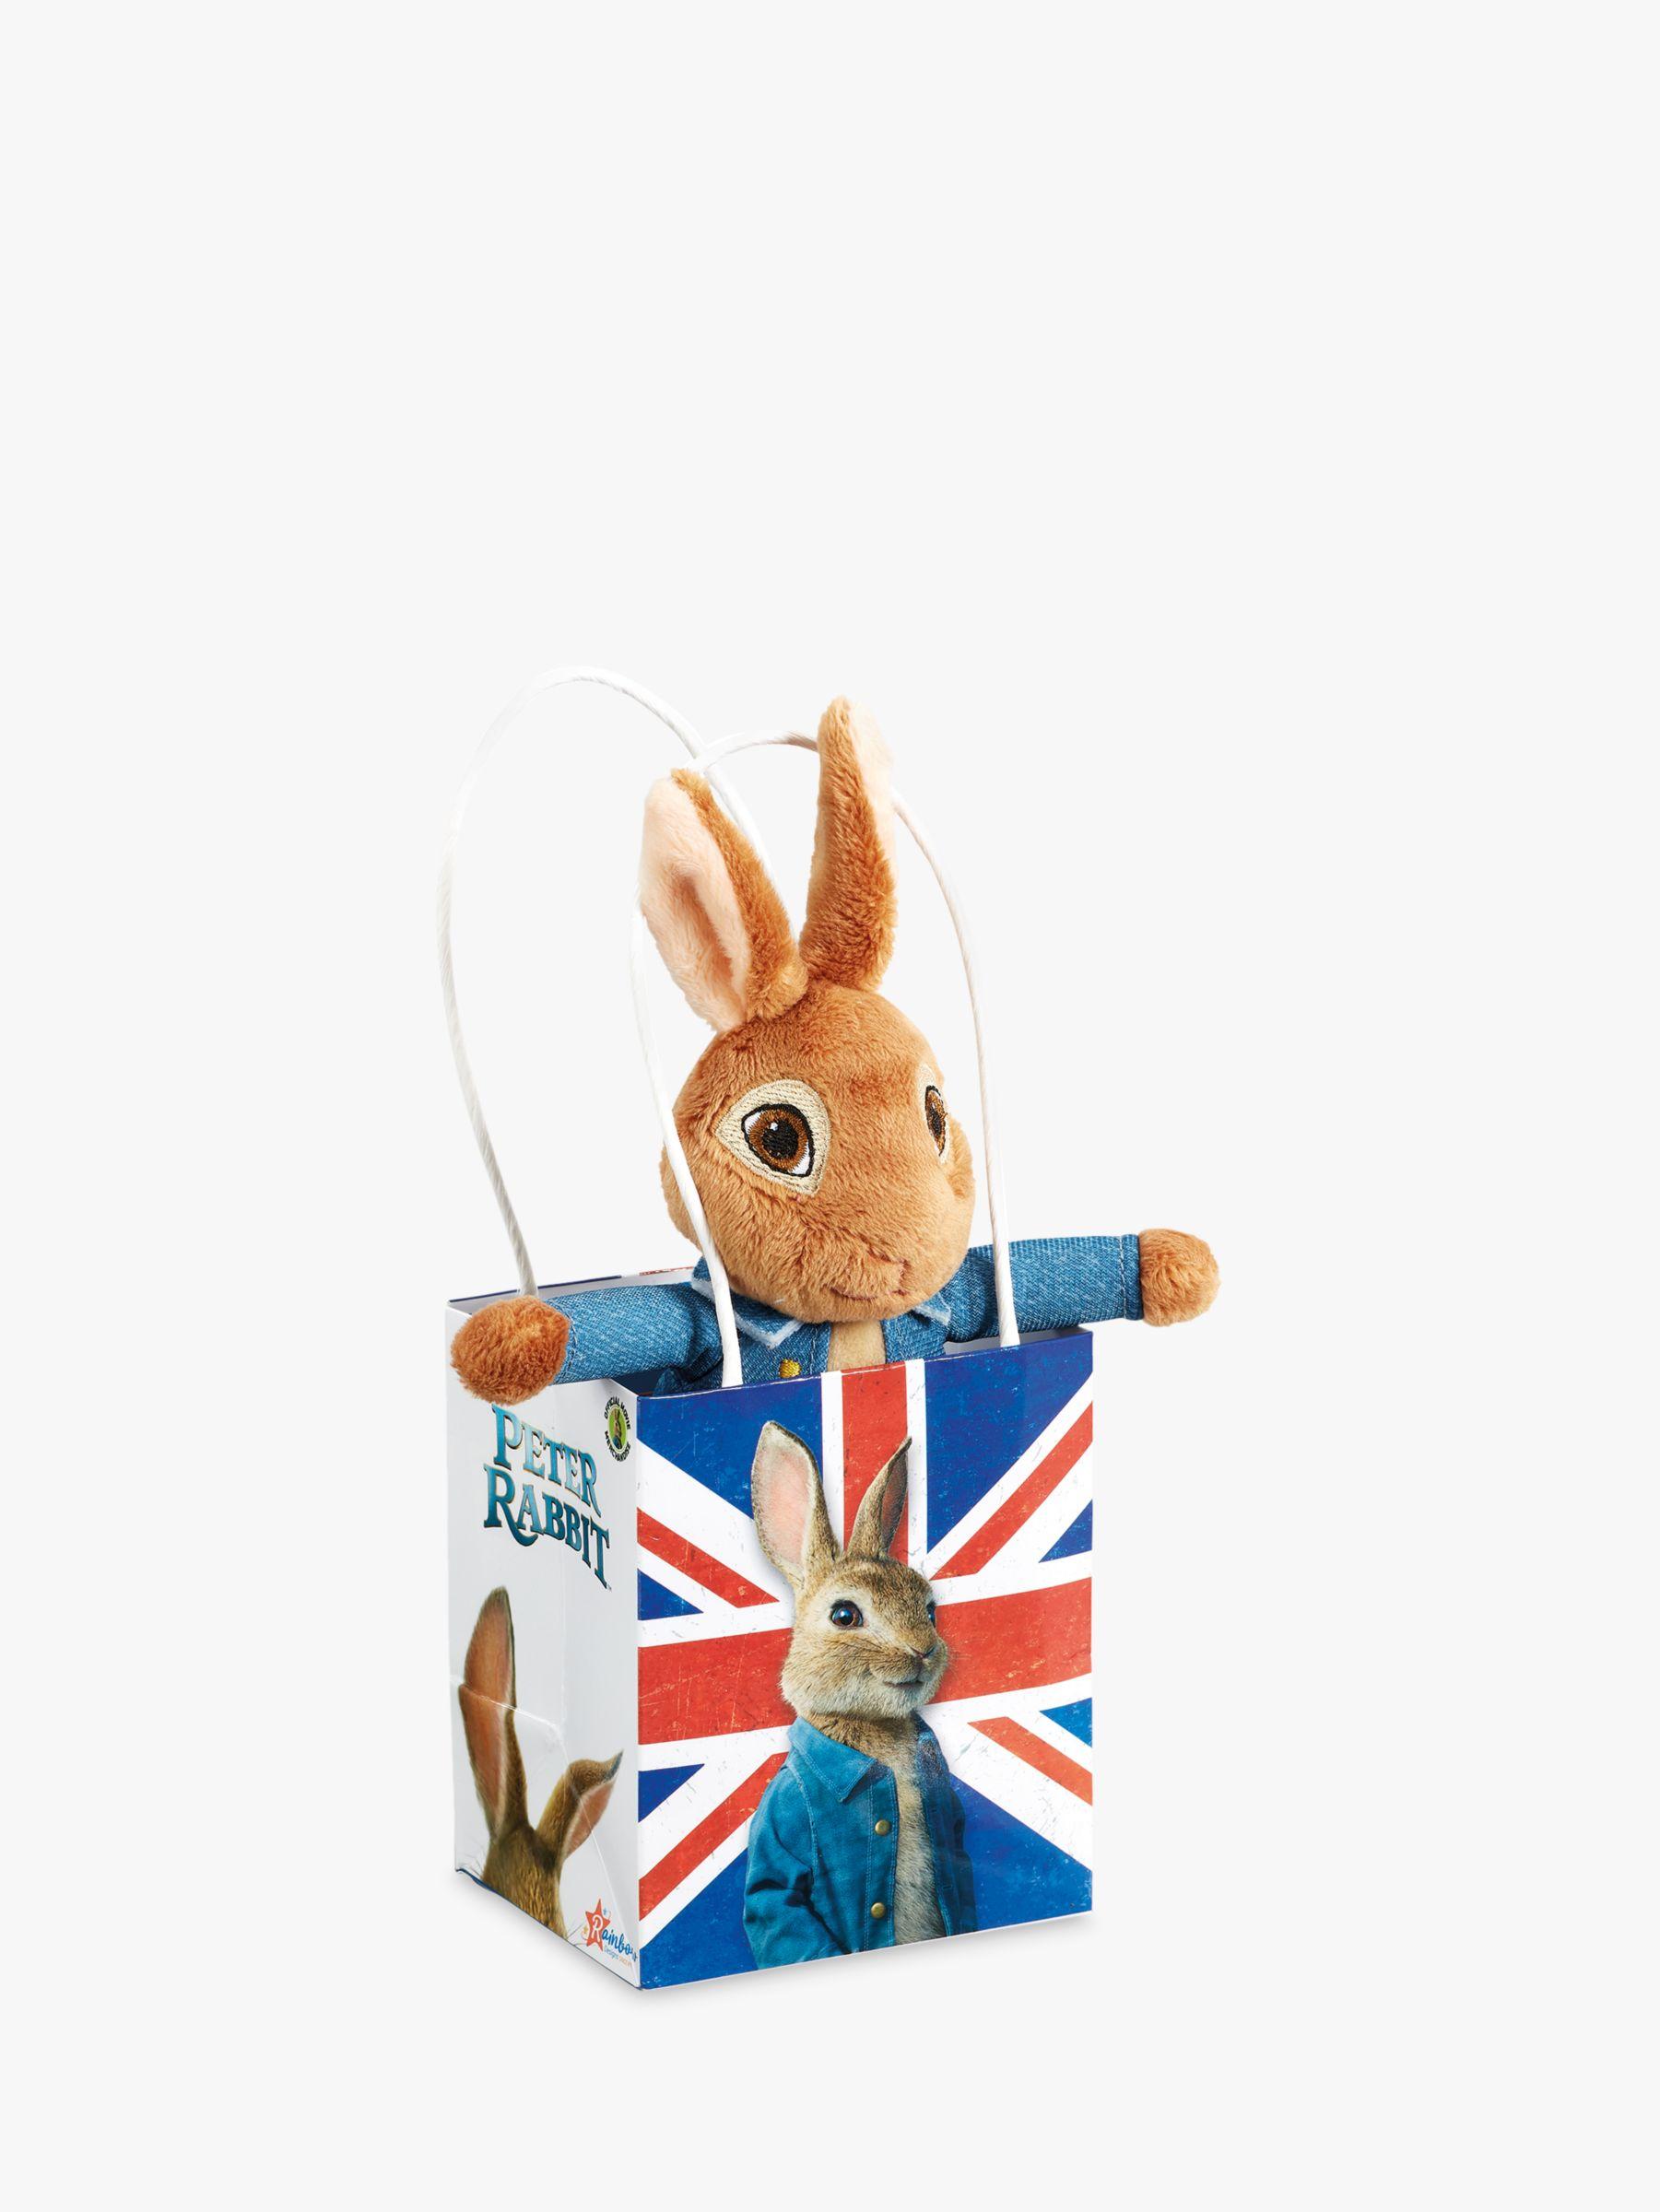 Beatrix Potter Beatrix Potter Peter Rabbit Movie Union Jack Bag Plush Soft Toy Baby Gift